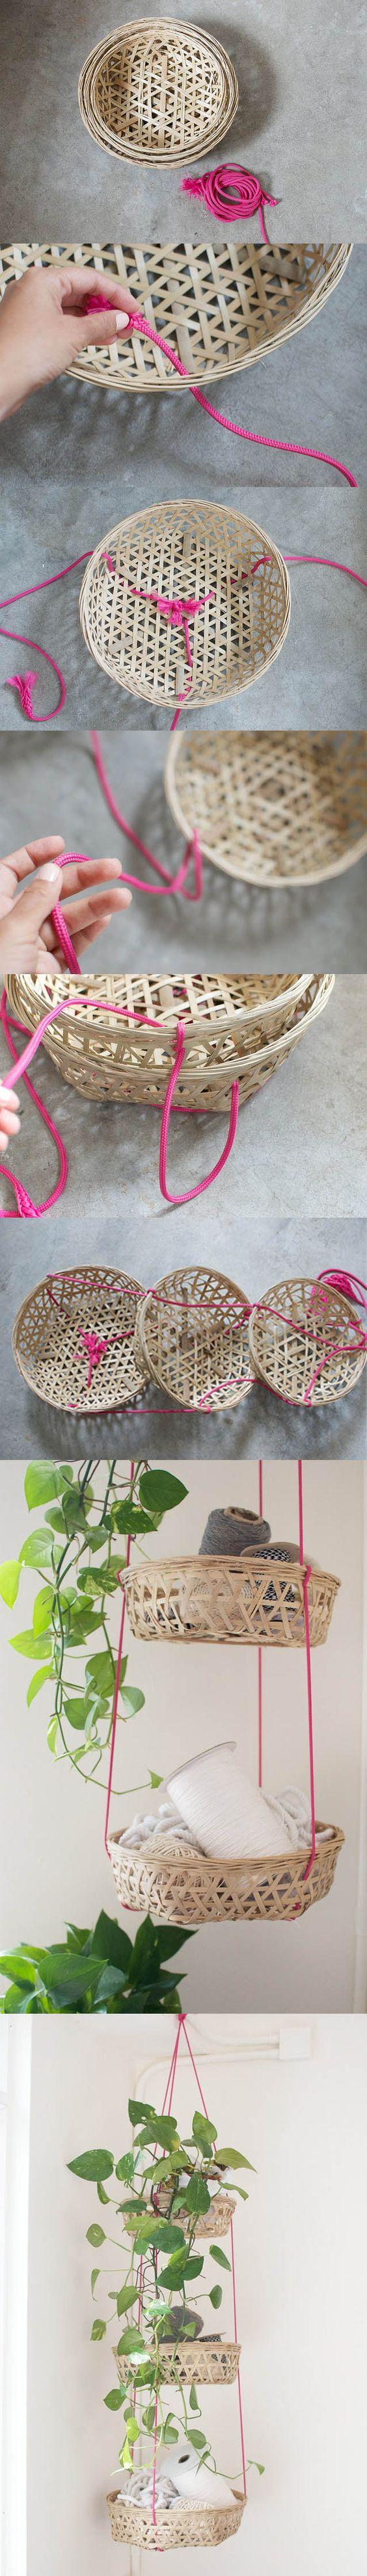 Paniers suspendus - Très simple - Cestas colgantes DIY / http://apairandasparediy.com/: